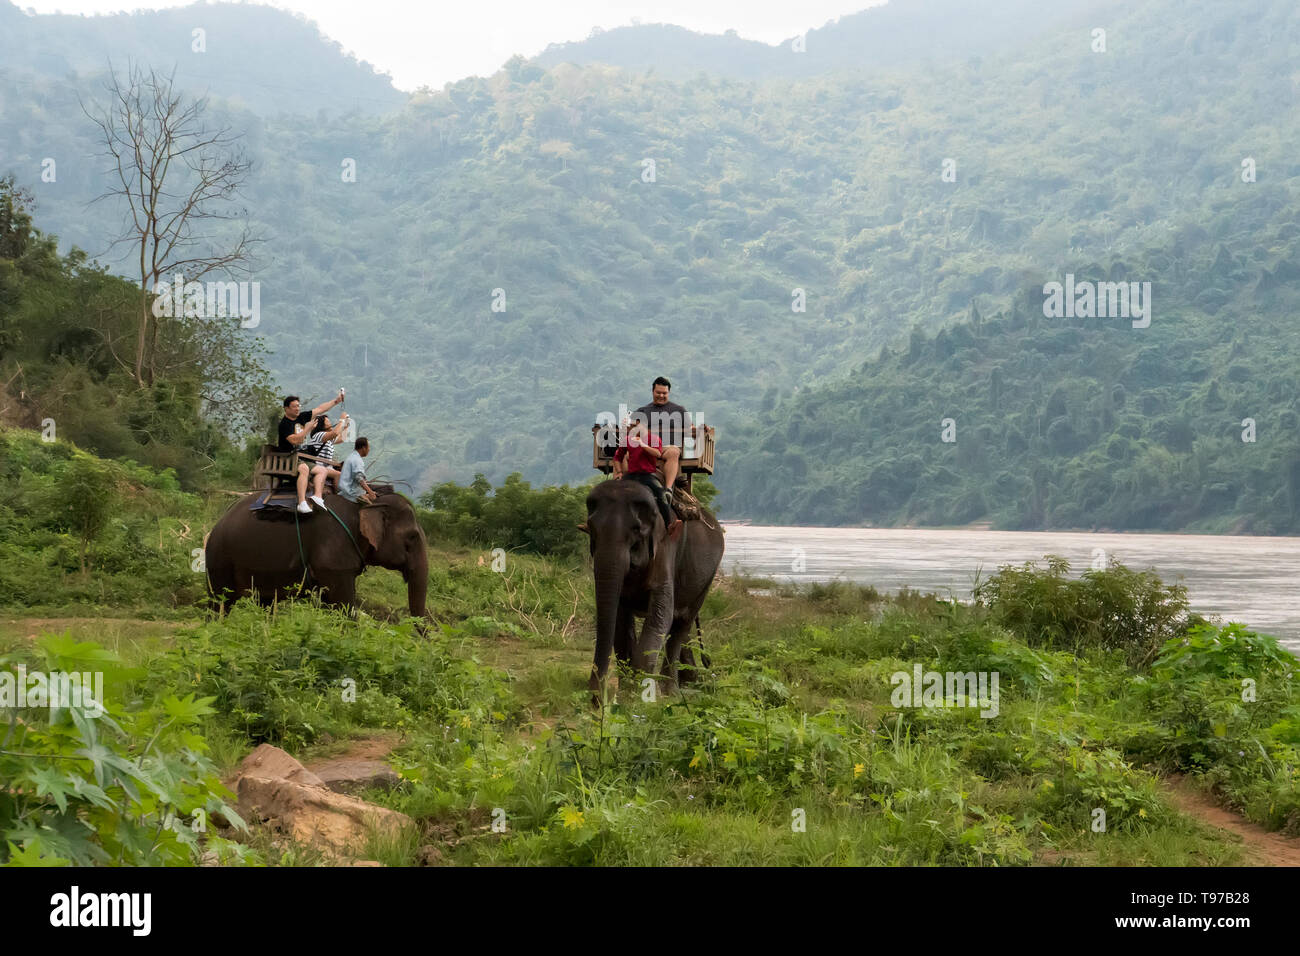 Tourist group rides through the jungle on the backs of elephants. Laos. Luang Prabang. - 15 January 2019 Stock Photo